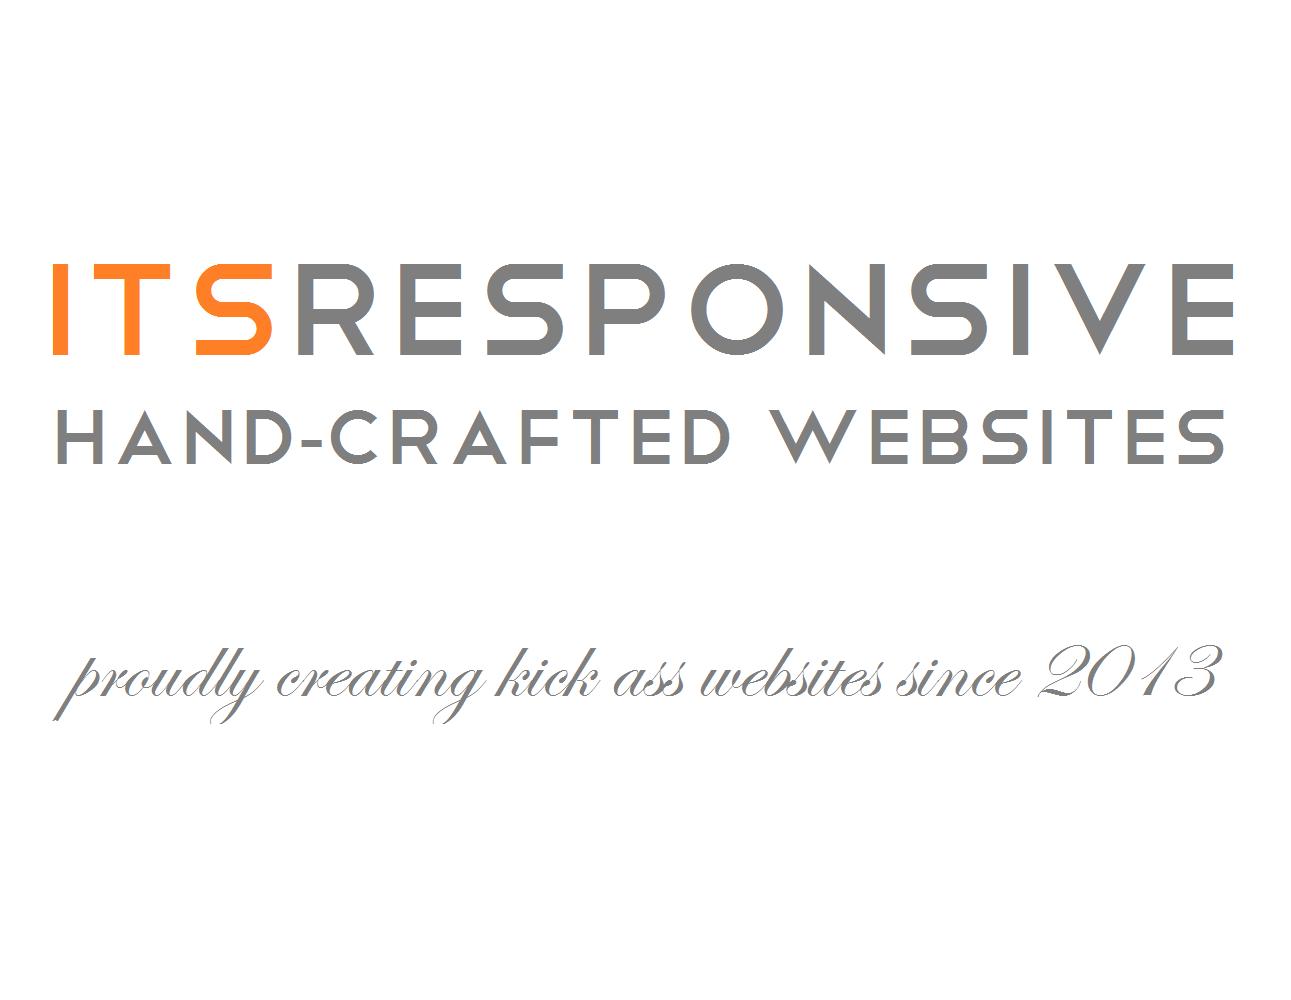 itsresponsive logo new square